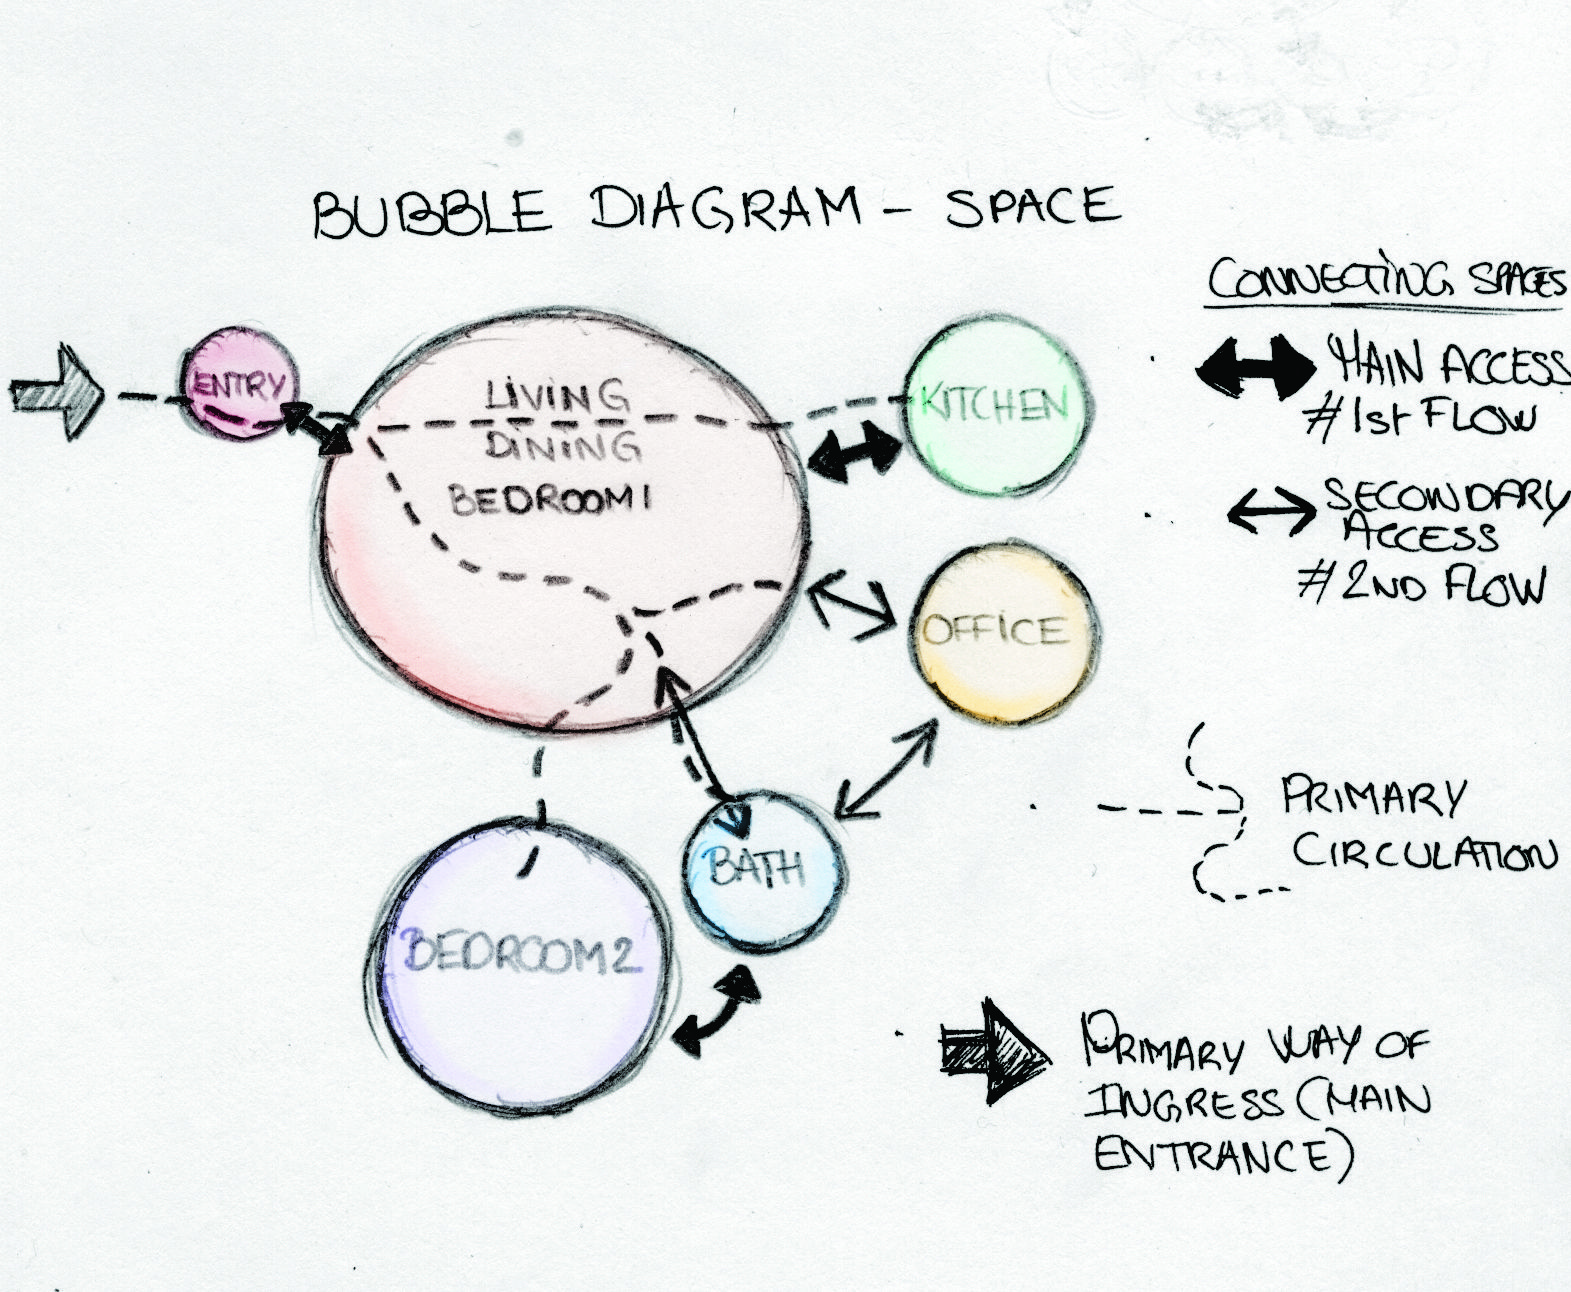 Bubble Diagram Space Distribution Home Cindy Aime Thesis